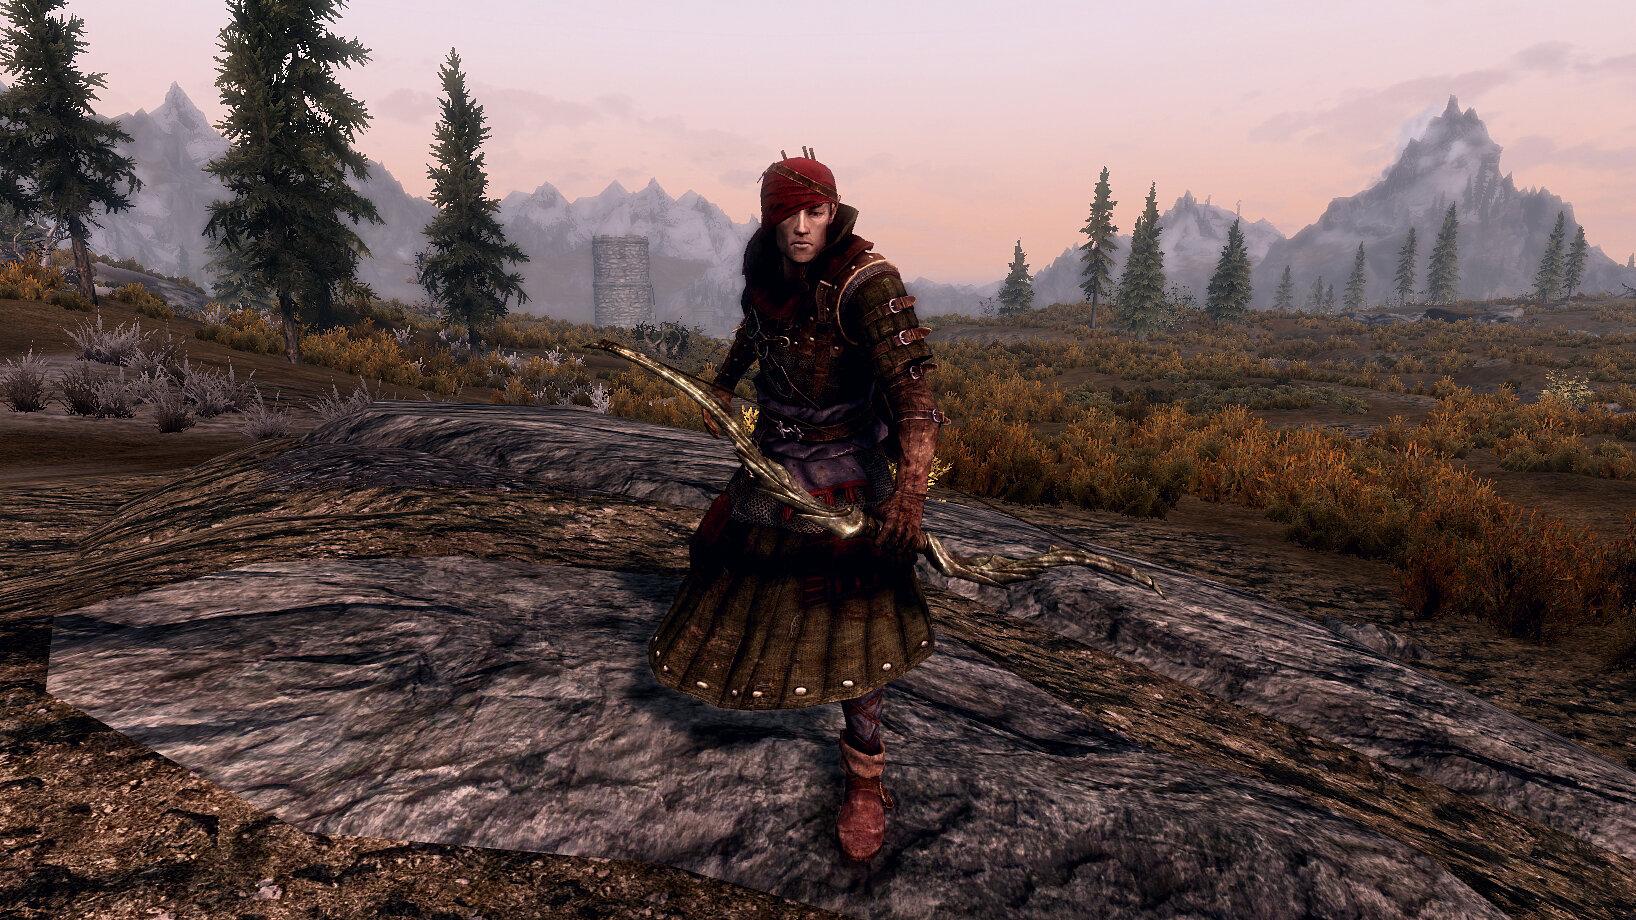 The Witcher 2 - Iorveth Light Armor | Ведьмак 2 - легкая броня Йорвета